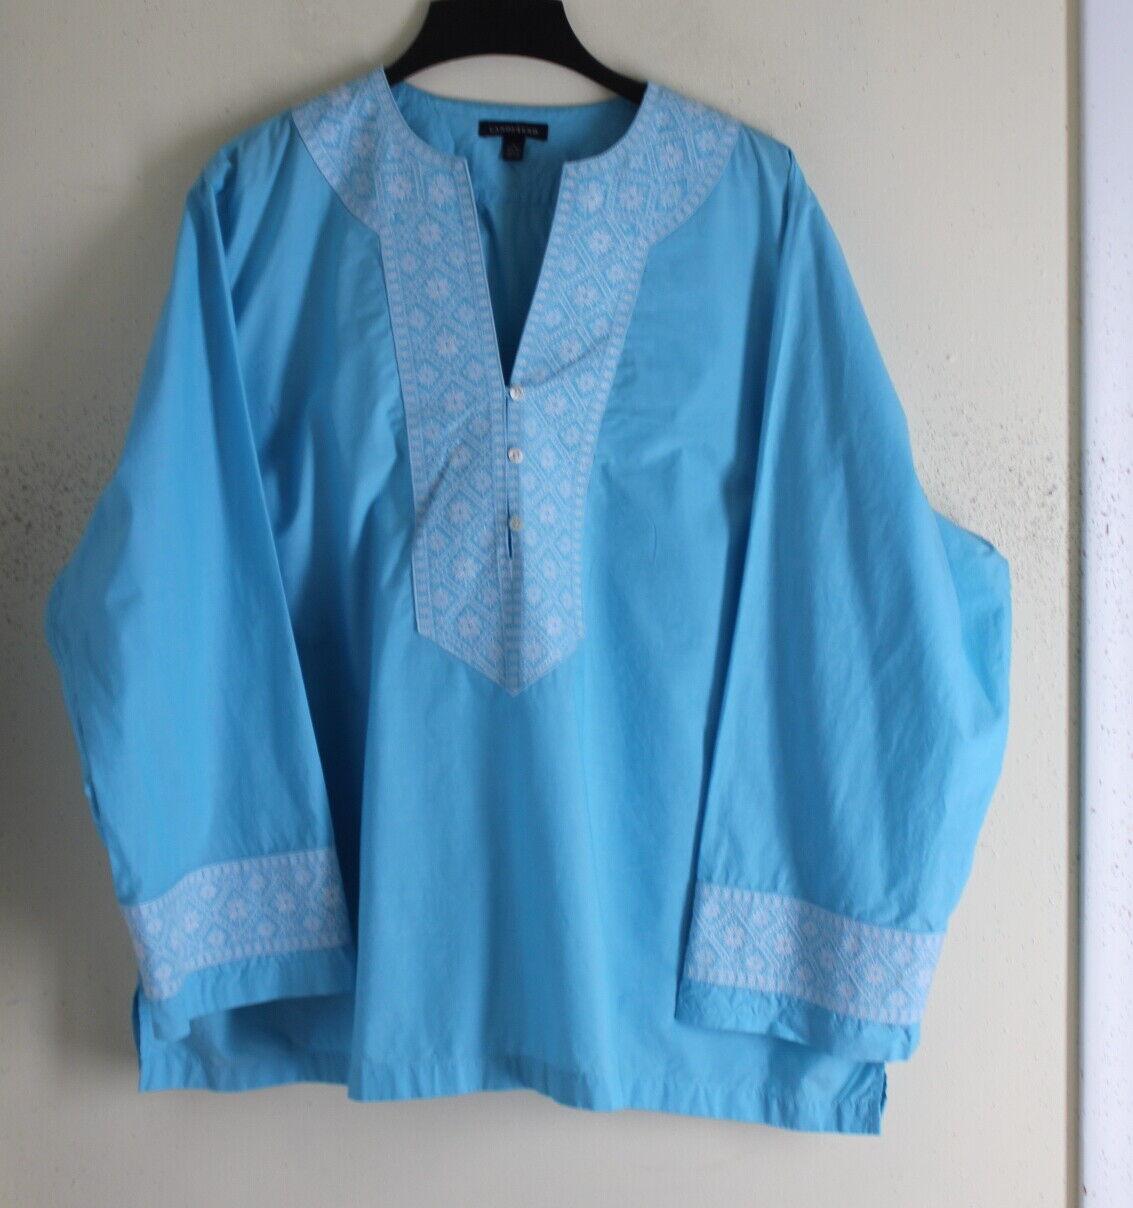 Lands End -Sz 3X Exquisite Crisp Cotton Ethnic Art-to-Wear Embroiderot Tunic Top